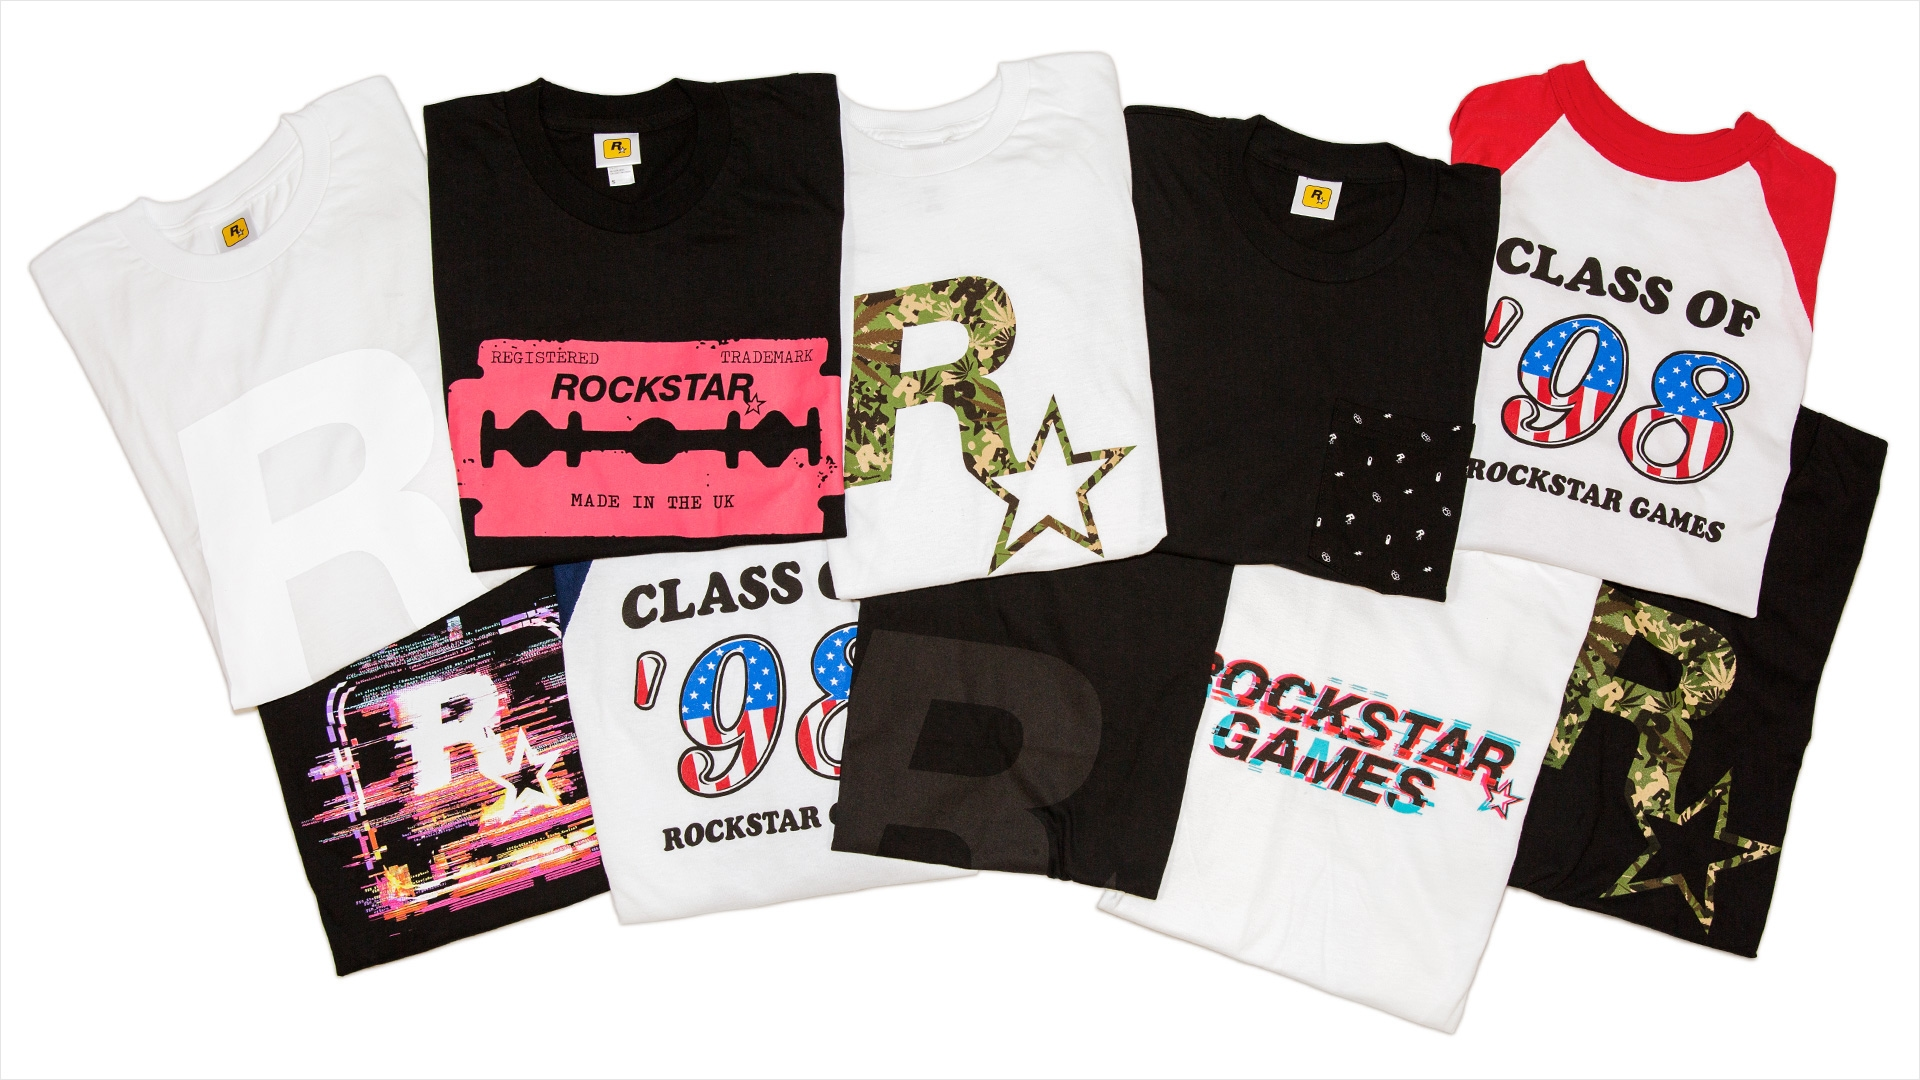 475945a438b Win the Rockstar Games Summer 2017 T-Shirt Collection